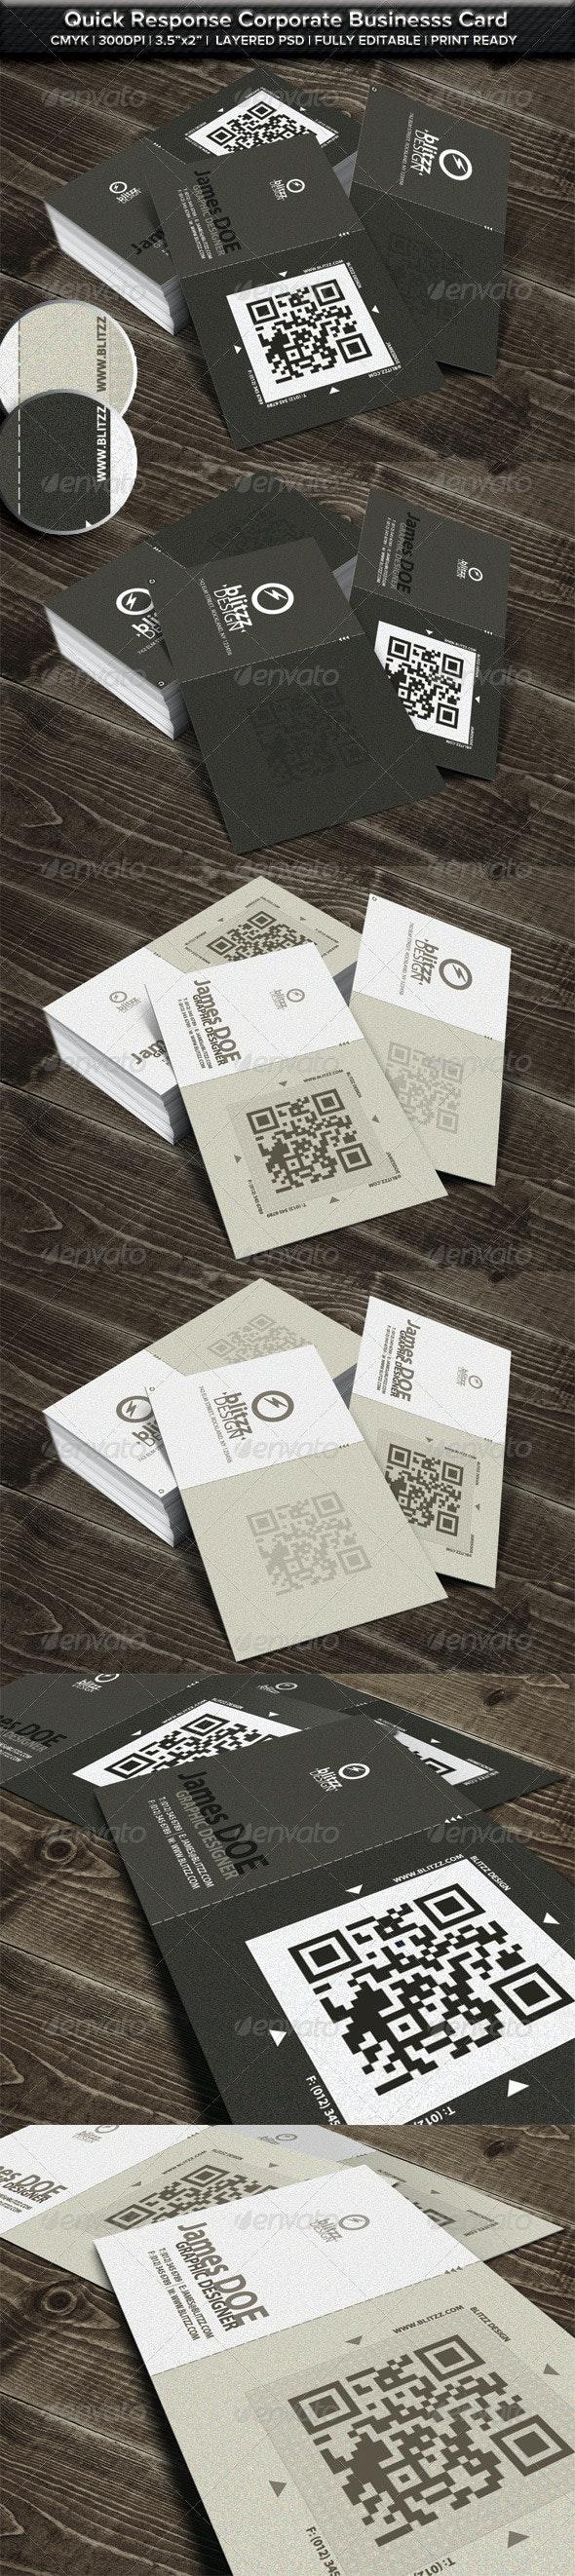 Elegant Corporate QR Business Card - Business Cards Print Templates